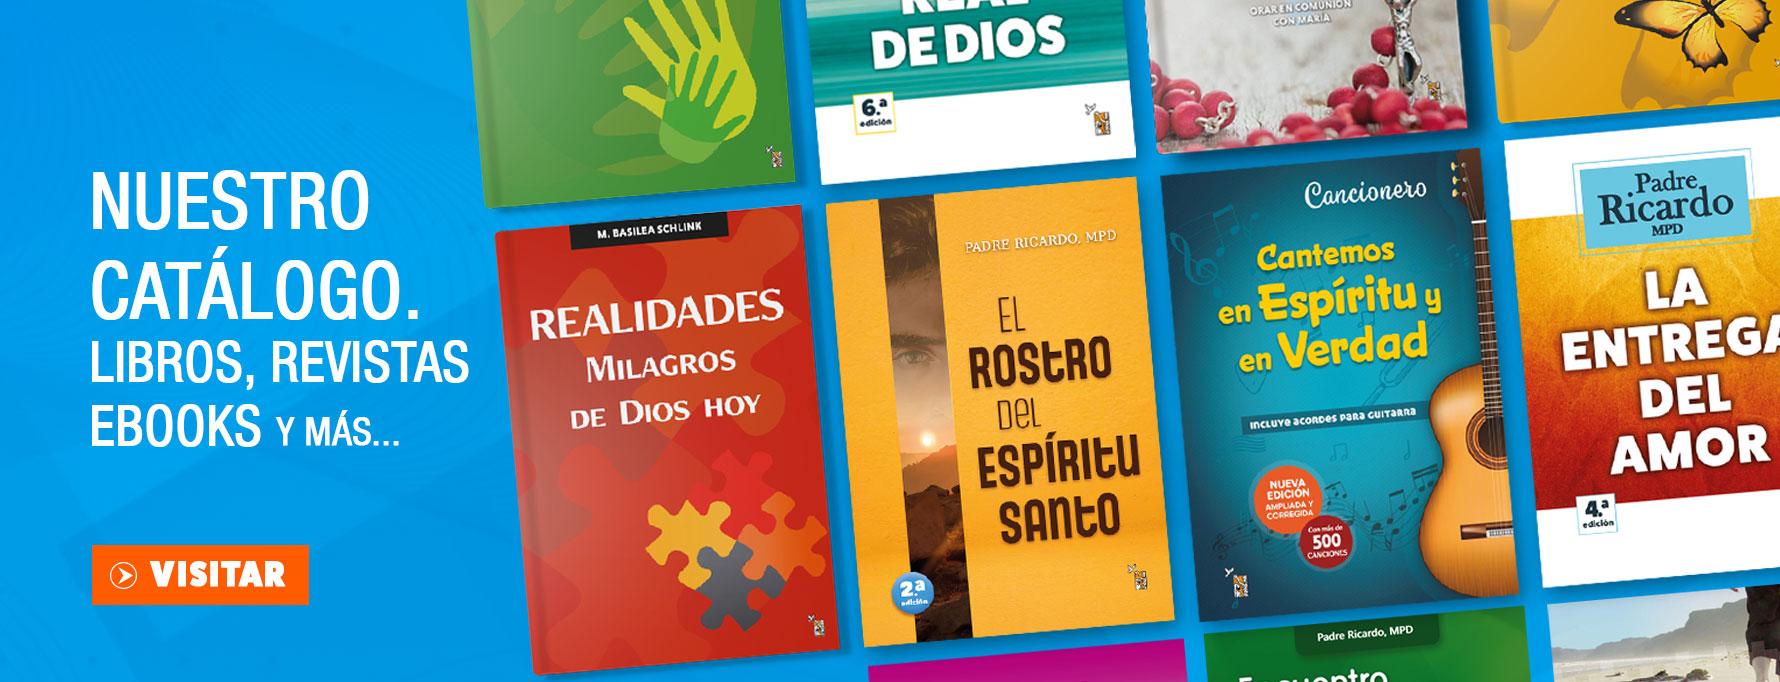 slider catalogo desktop